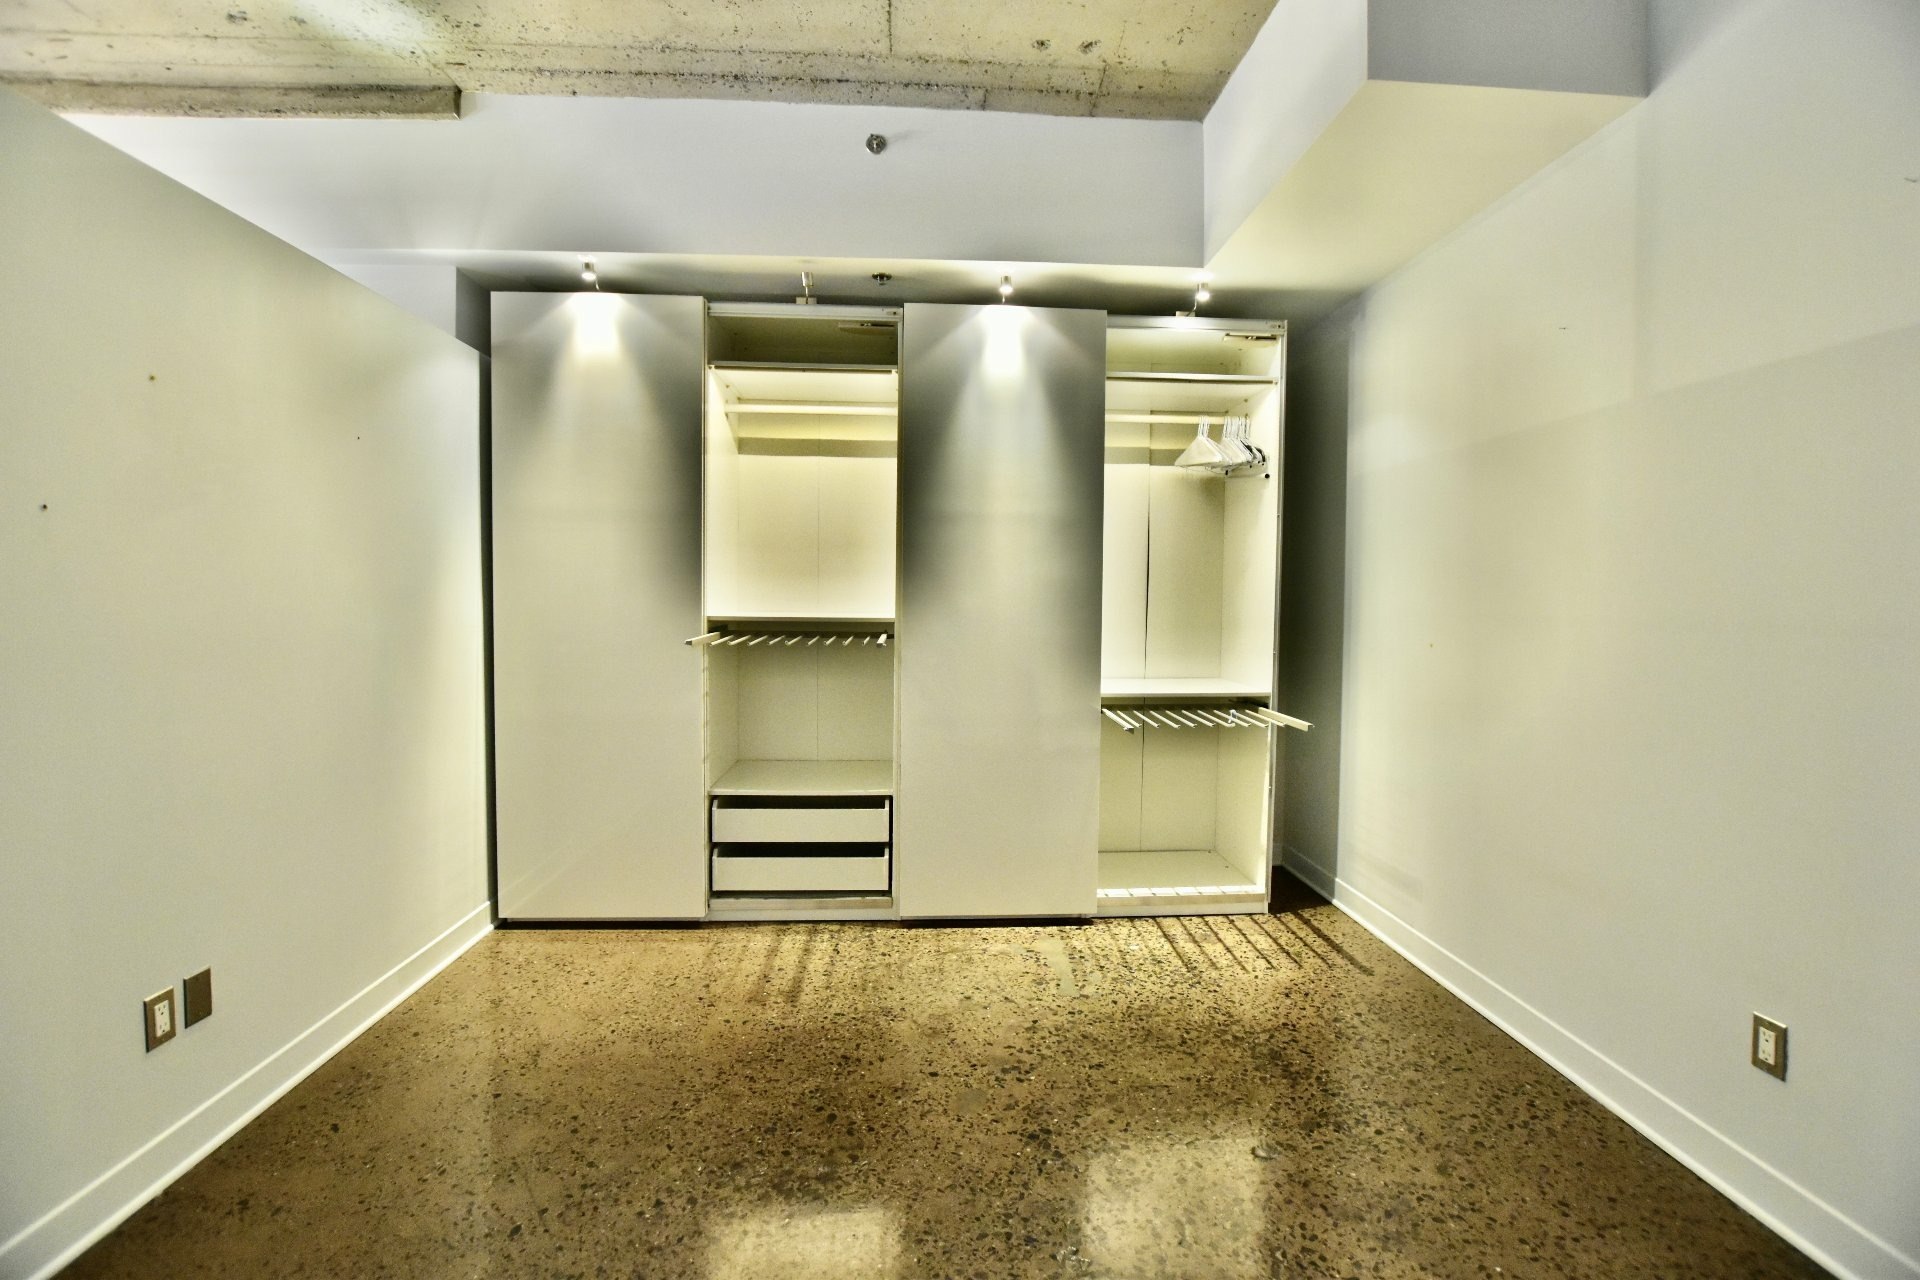 image 18 - Departamento Para alquiler Villeray/Saint-Michel/Parc-Extension Montréal  - 5 habitaciones